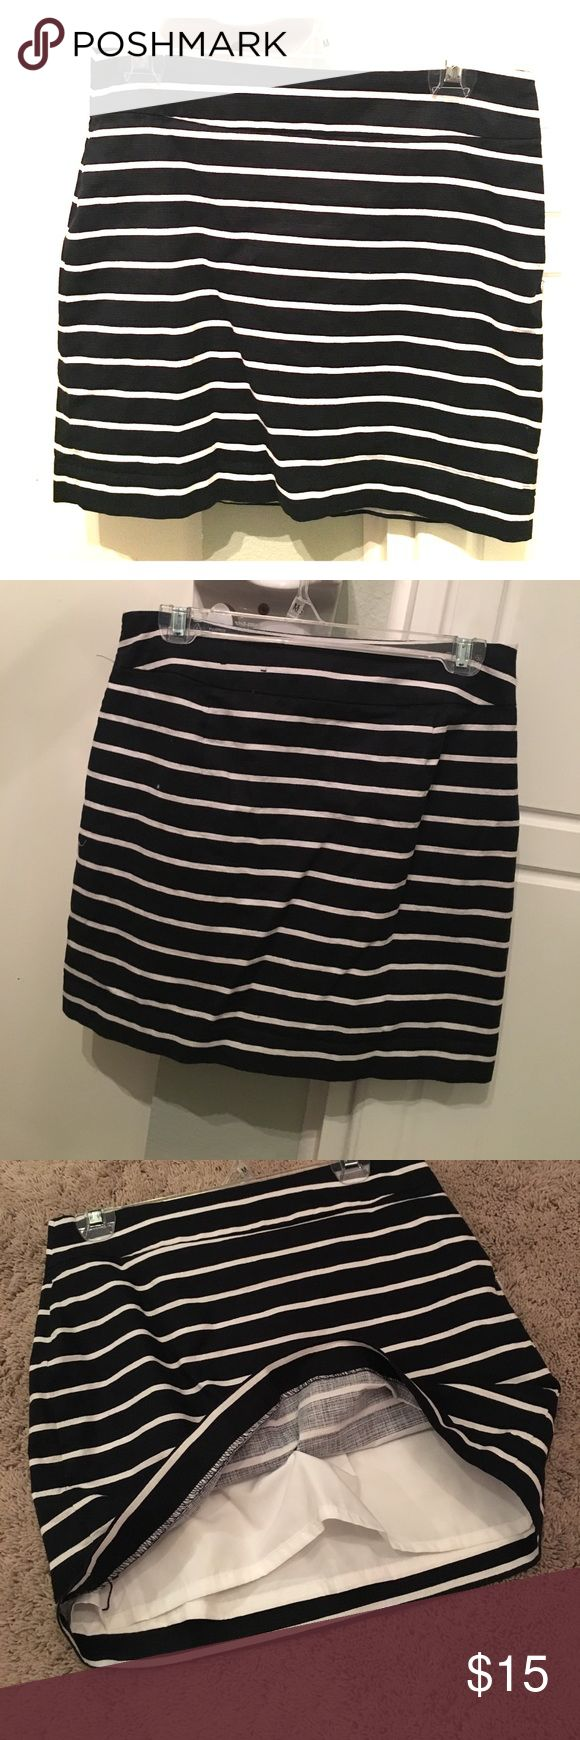 Banana republic navy striped skirt Banana republic navy and white striped skirt. Has inner lining. Banana Republic Skirts Mini